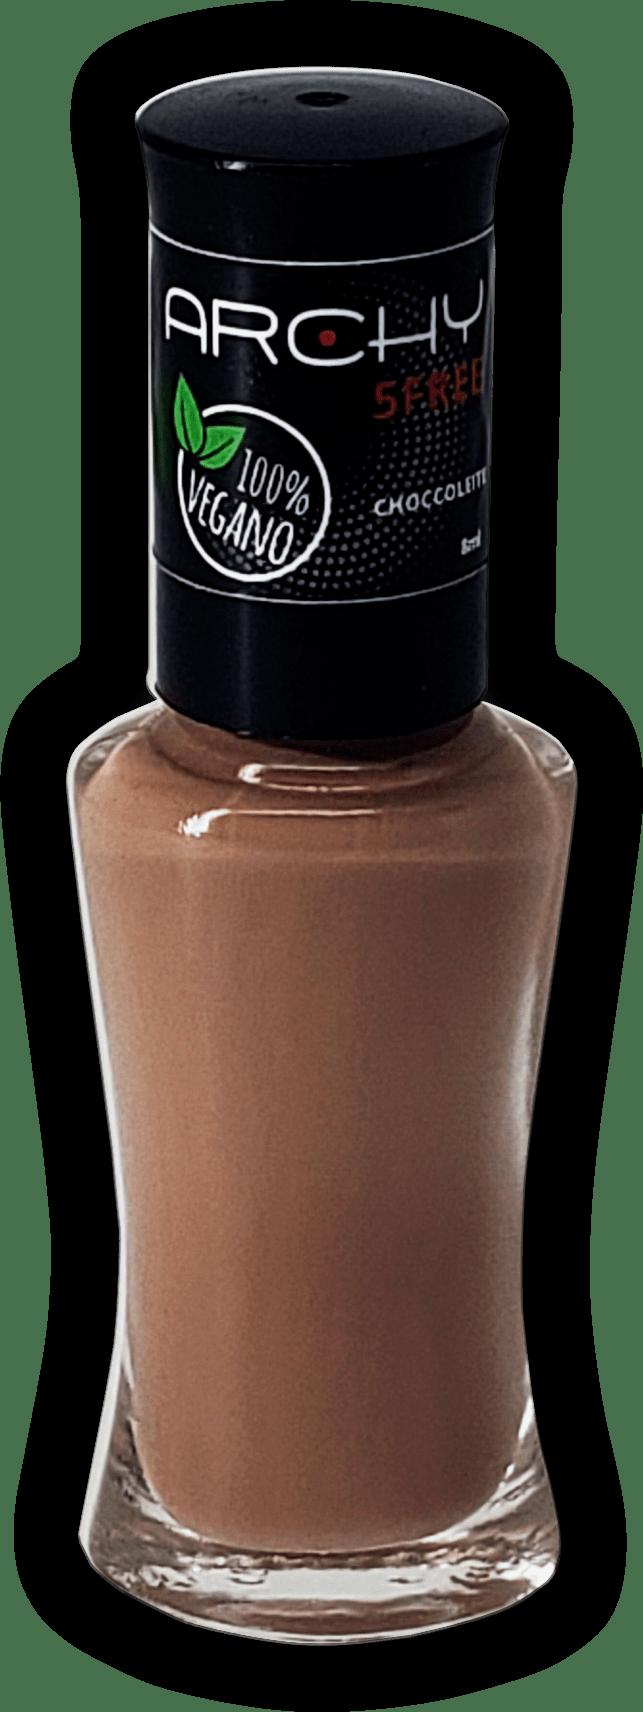 Esmalte Vegano 5 Free Chocoleite - Archy Make Up